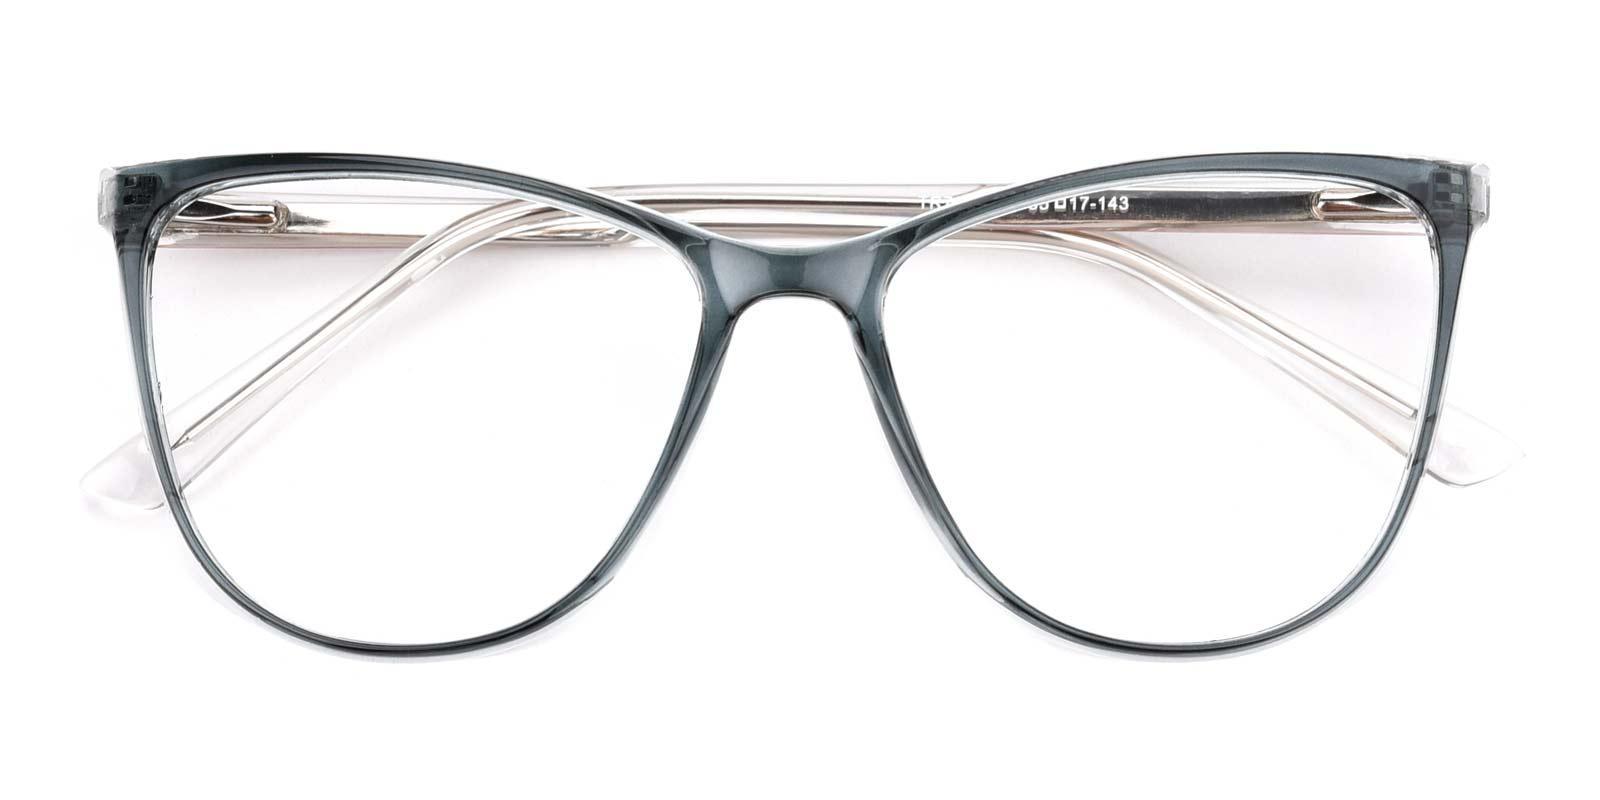 Lena-Green-Cat-TR-Eyeglasses-detail